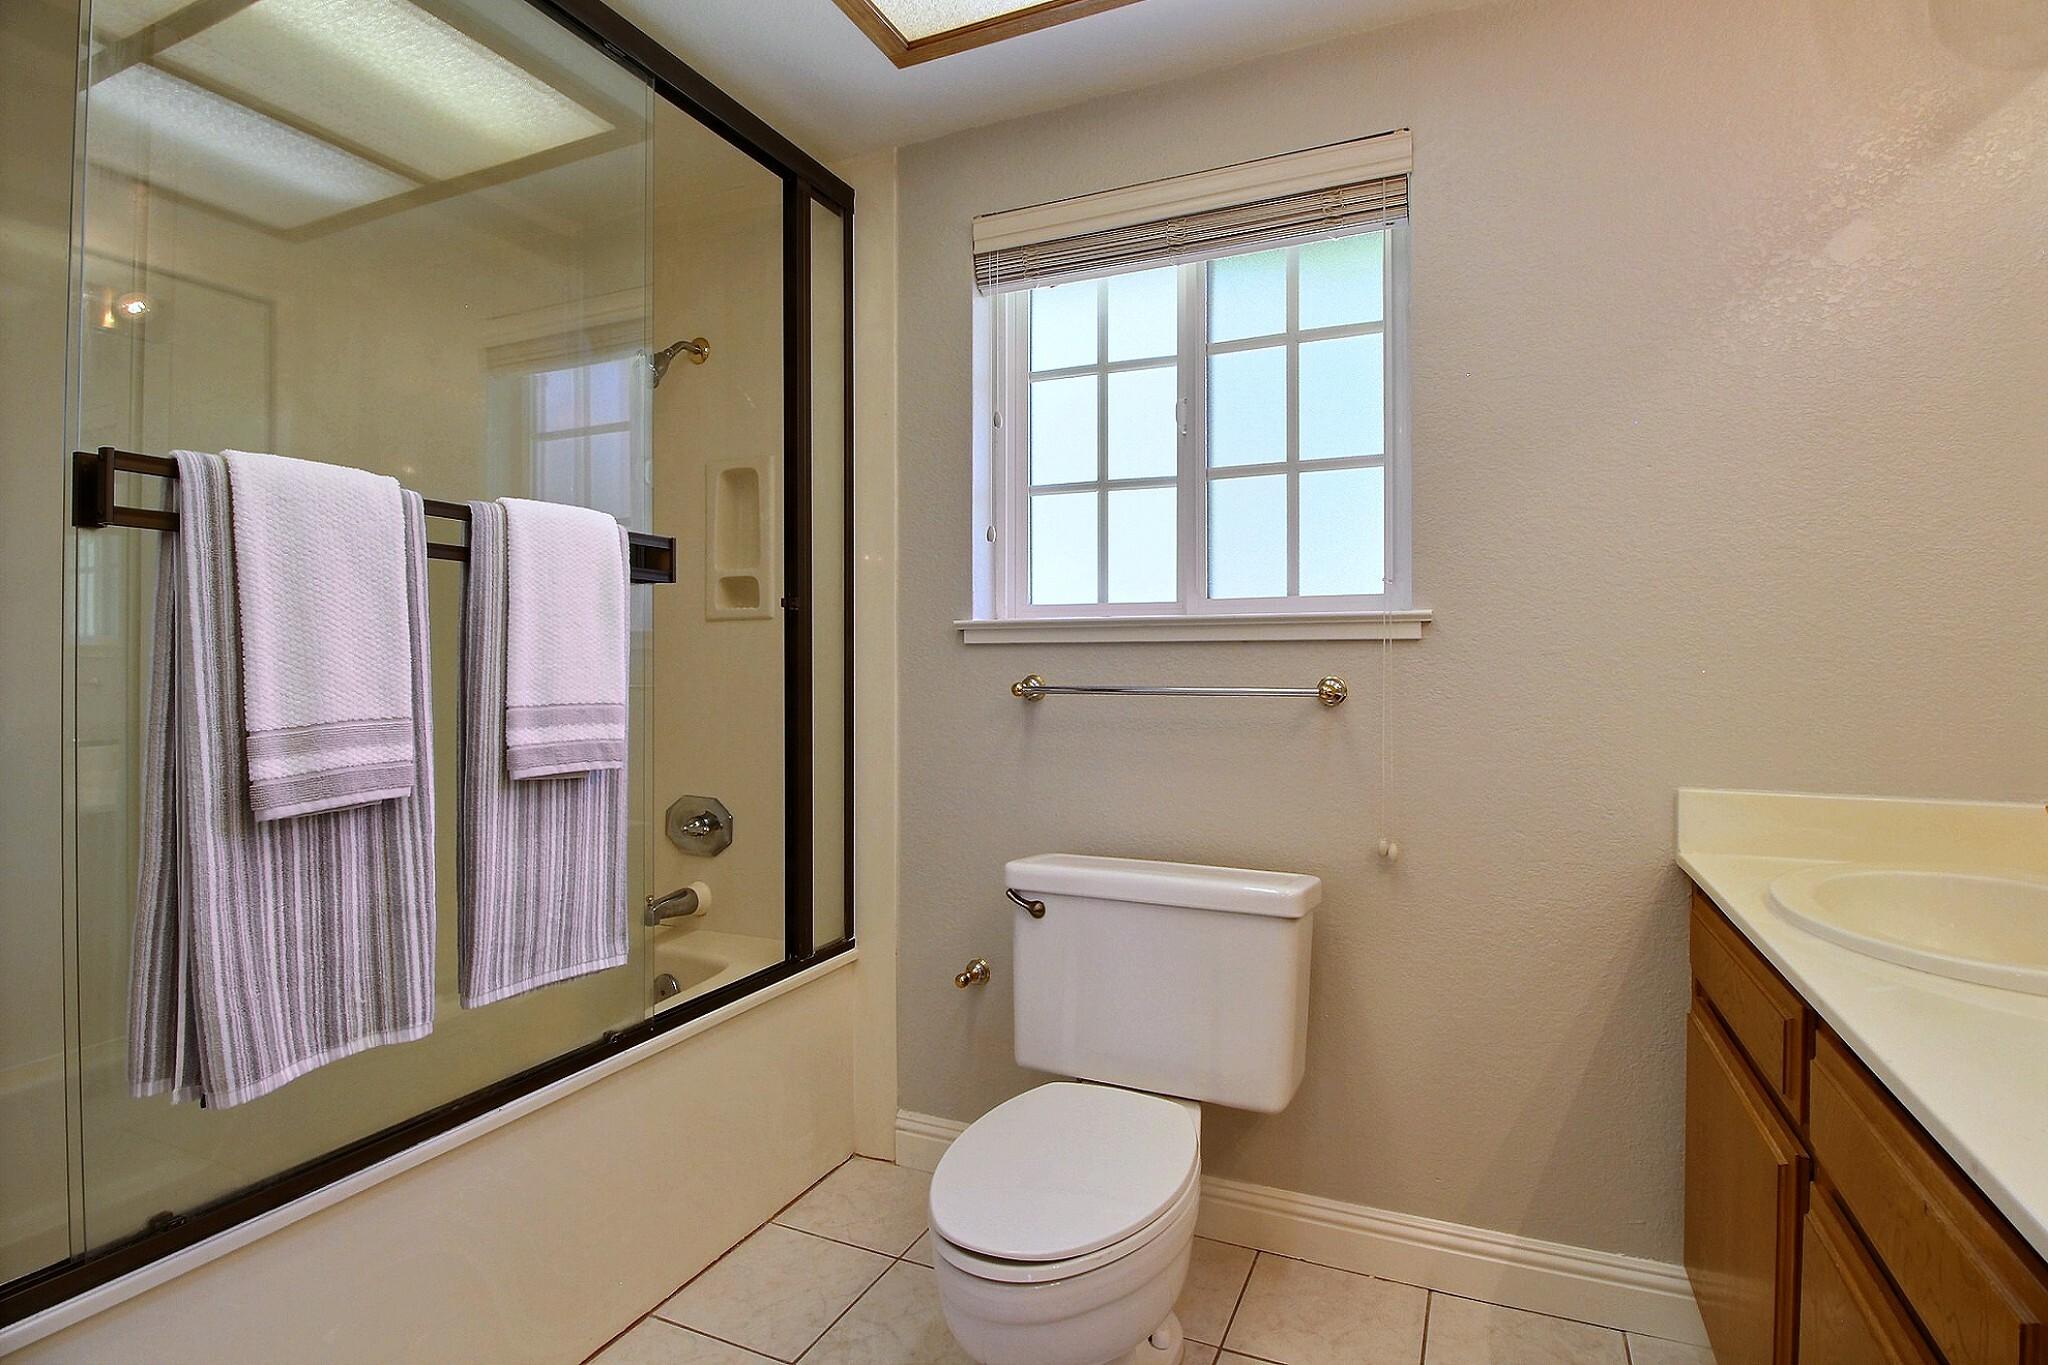 exposio_14_bathroom_2_02_2433_wildhorse_